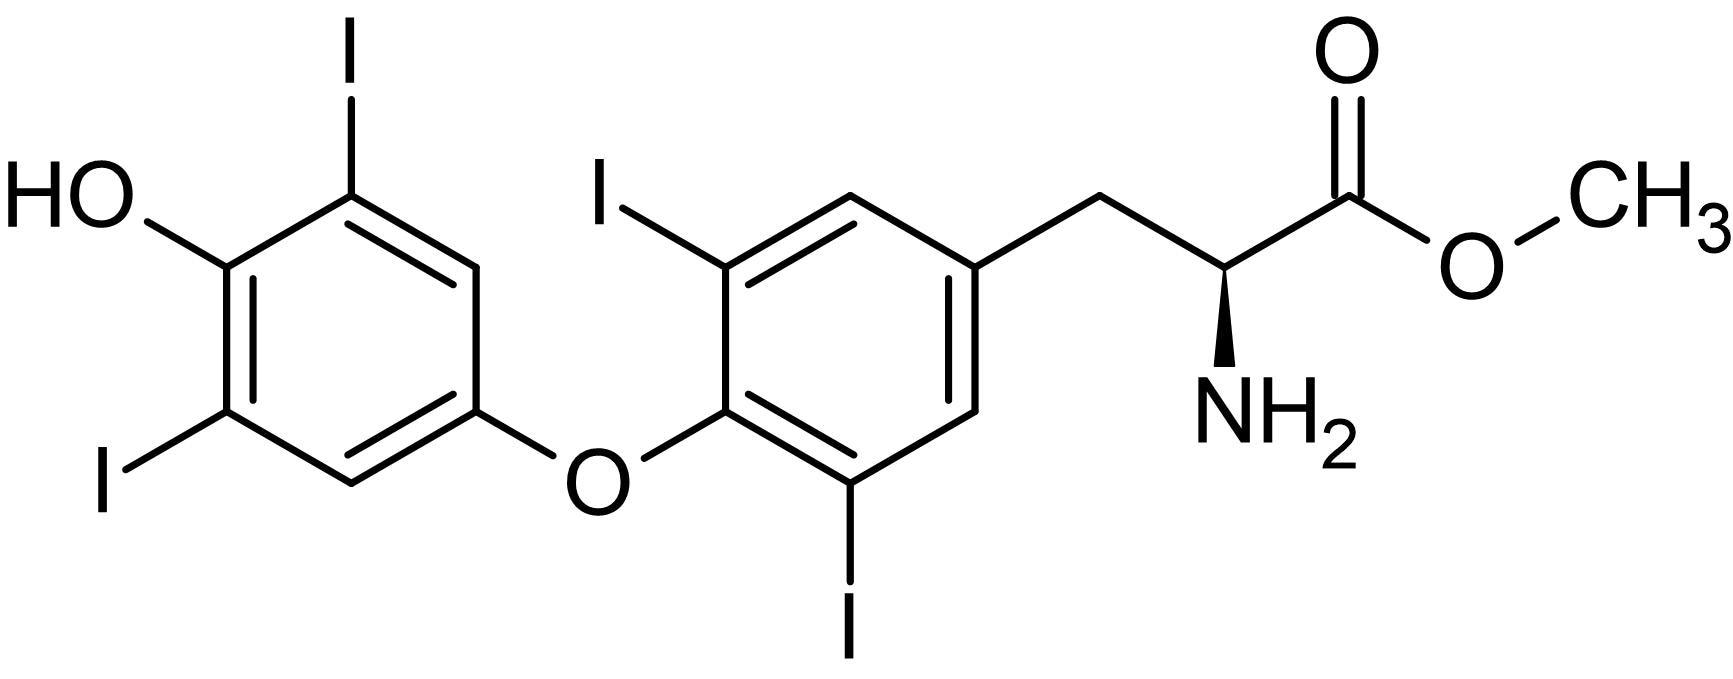 Chemical Structure - Thyroxine methyl ester, Malate dehydrogenase inhibitor (ab146114)